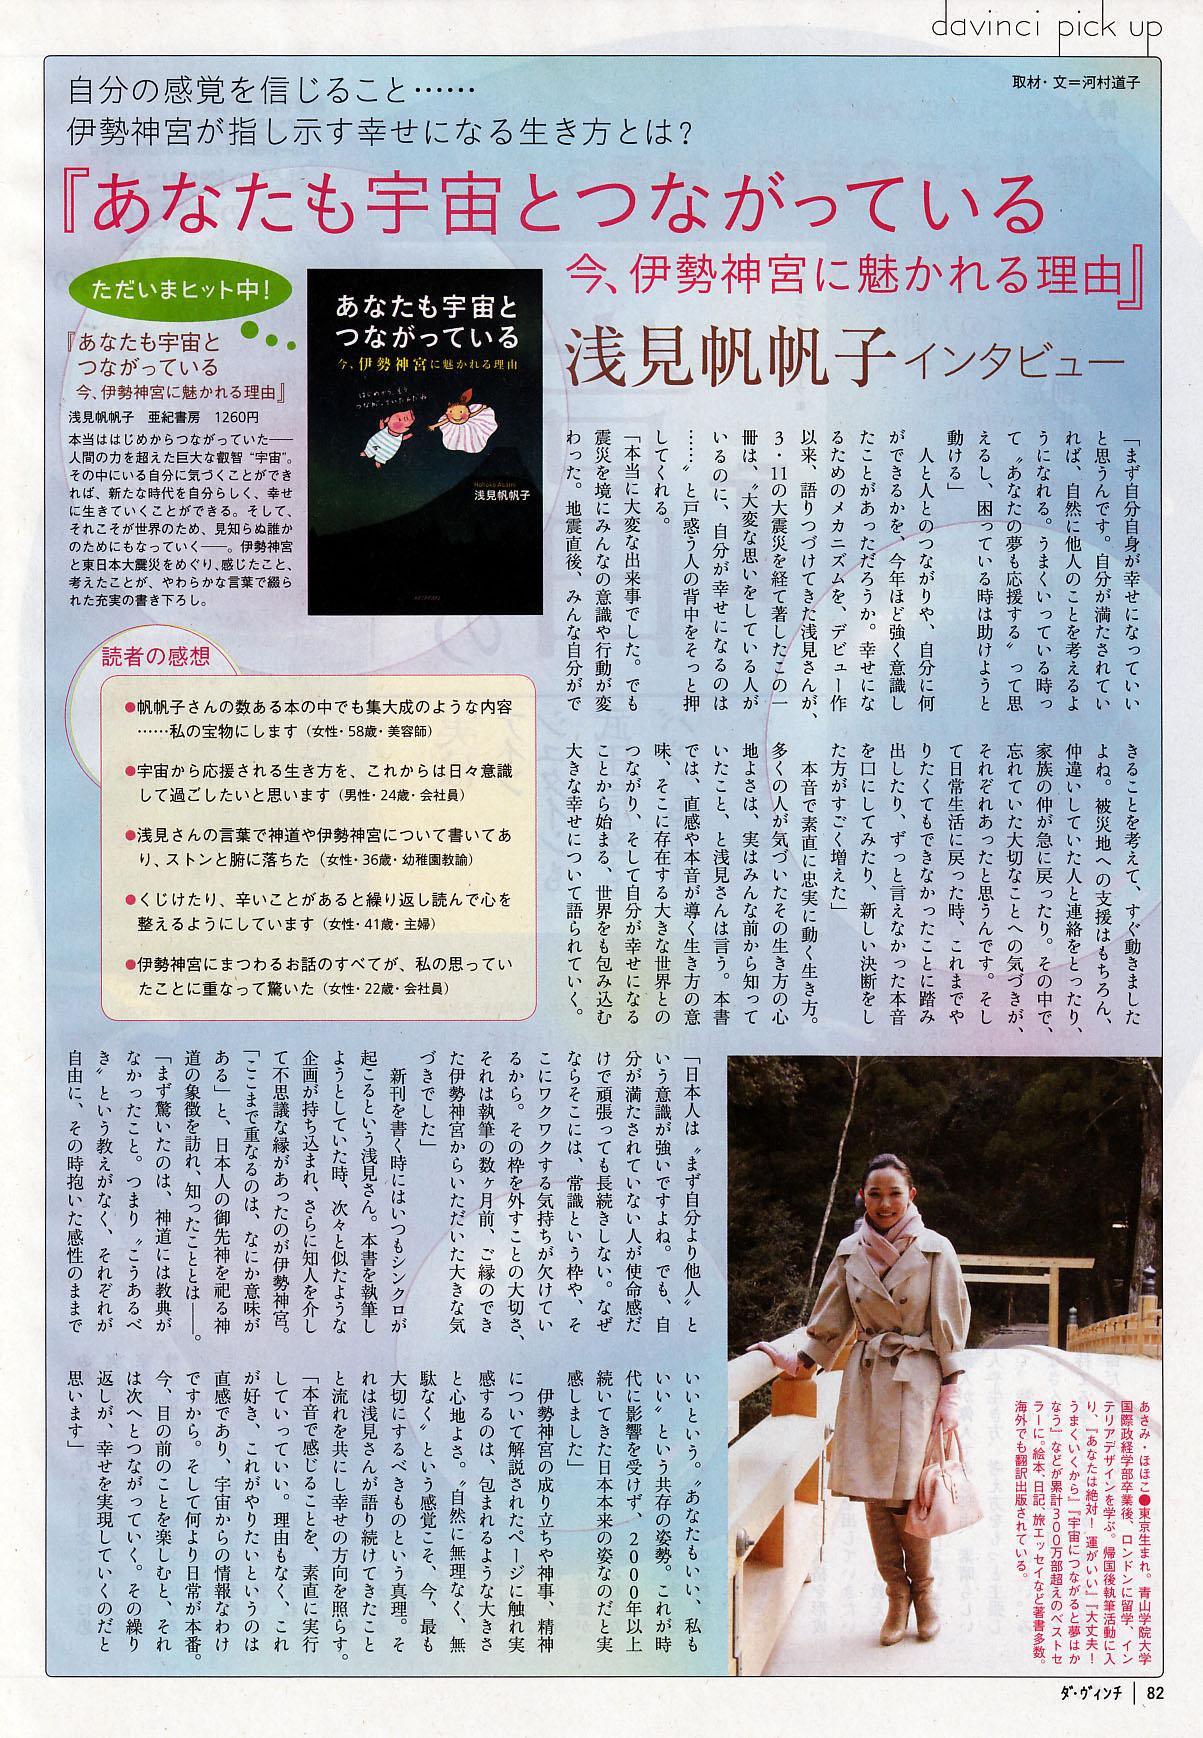 http://www.hohoko-style.com/media/images/pics/davinci_article_300dpi.jpg